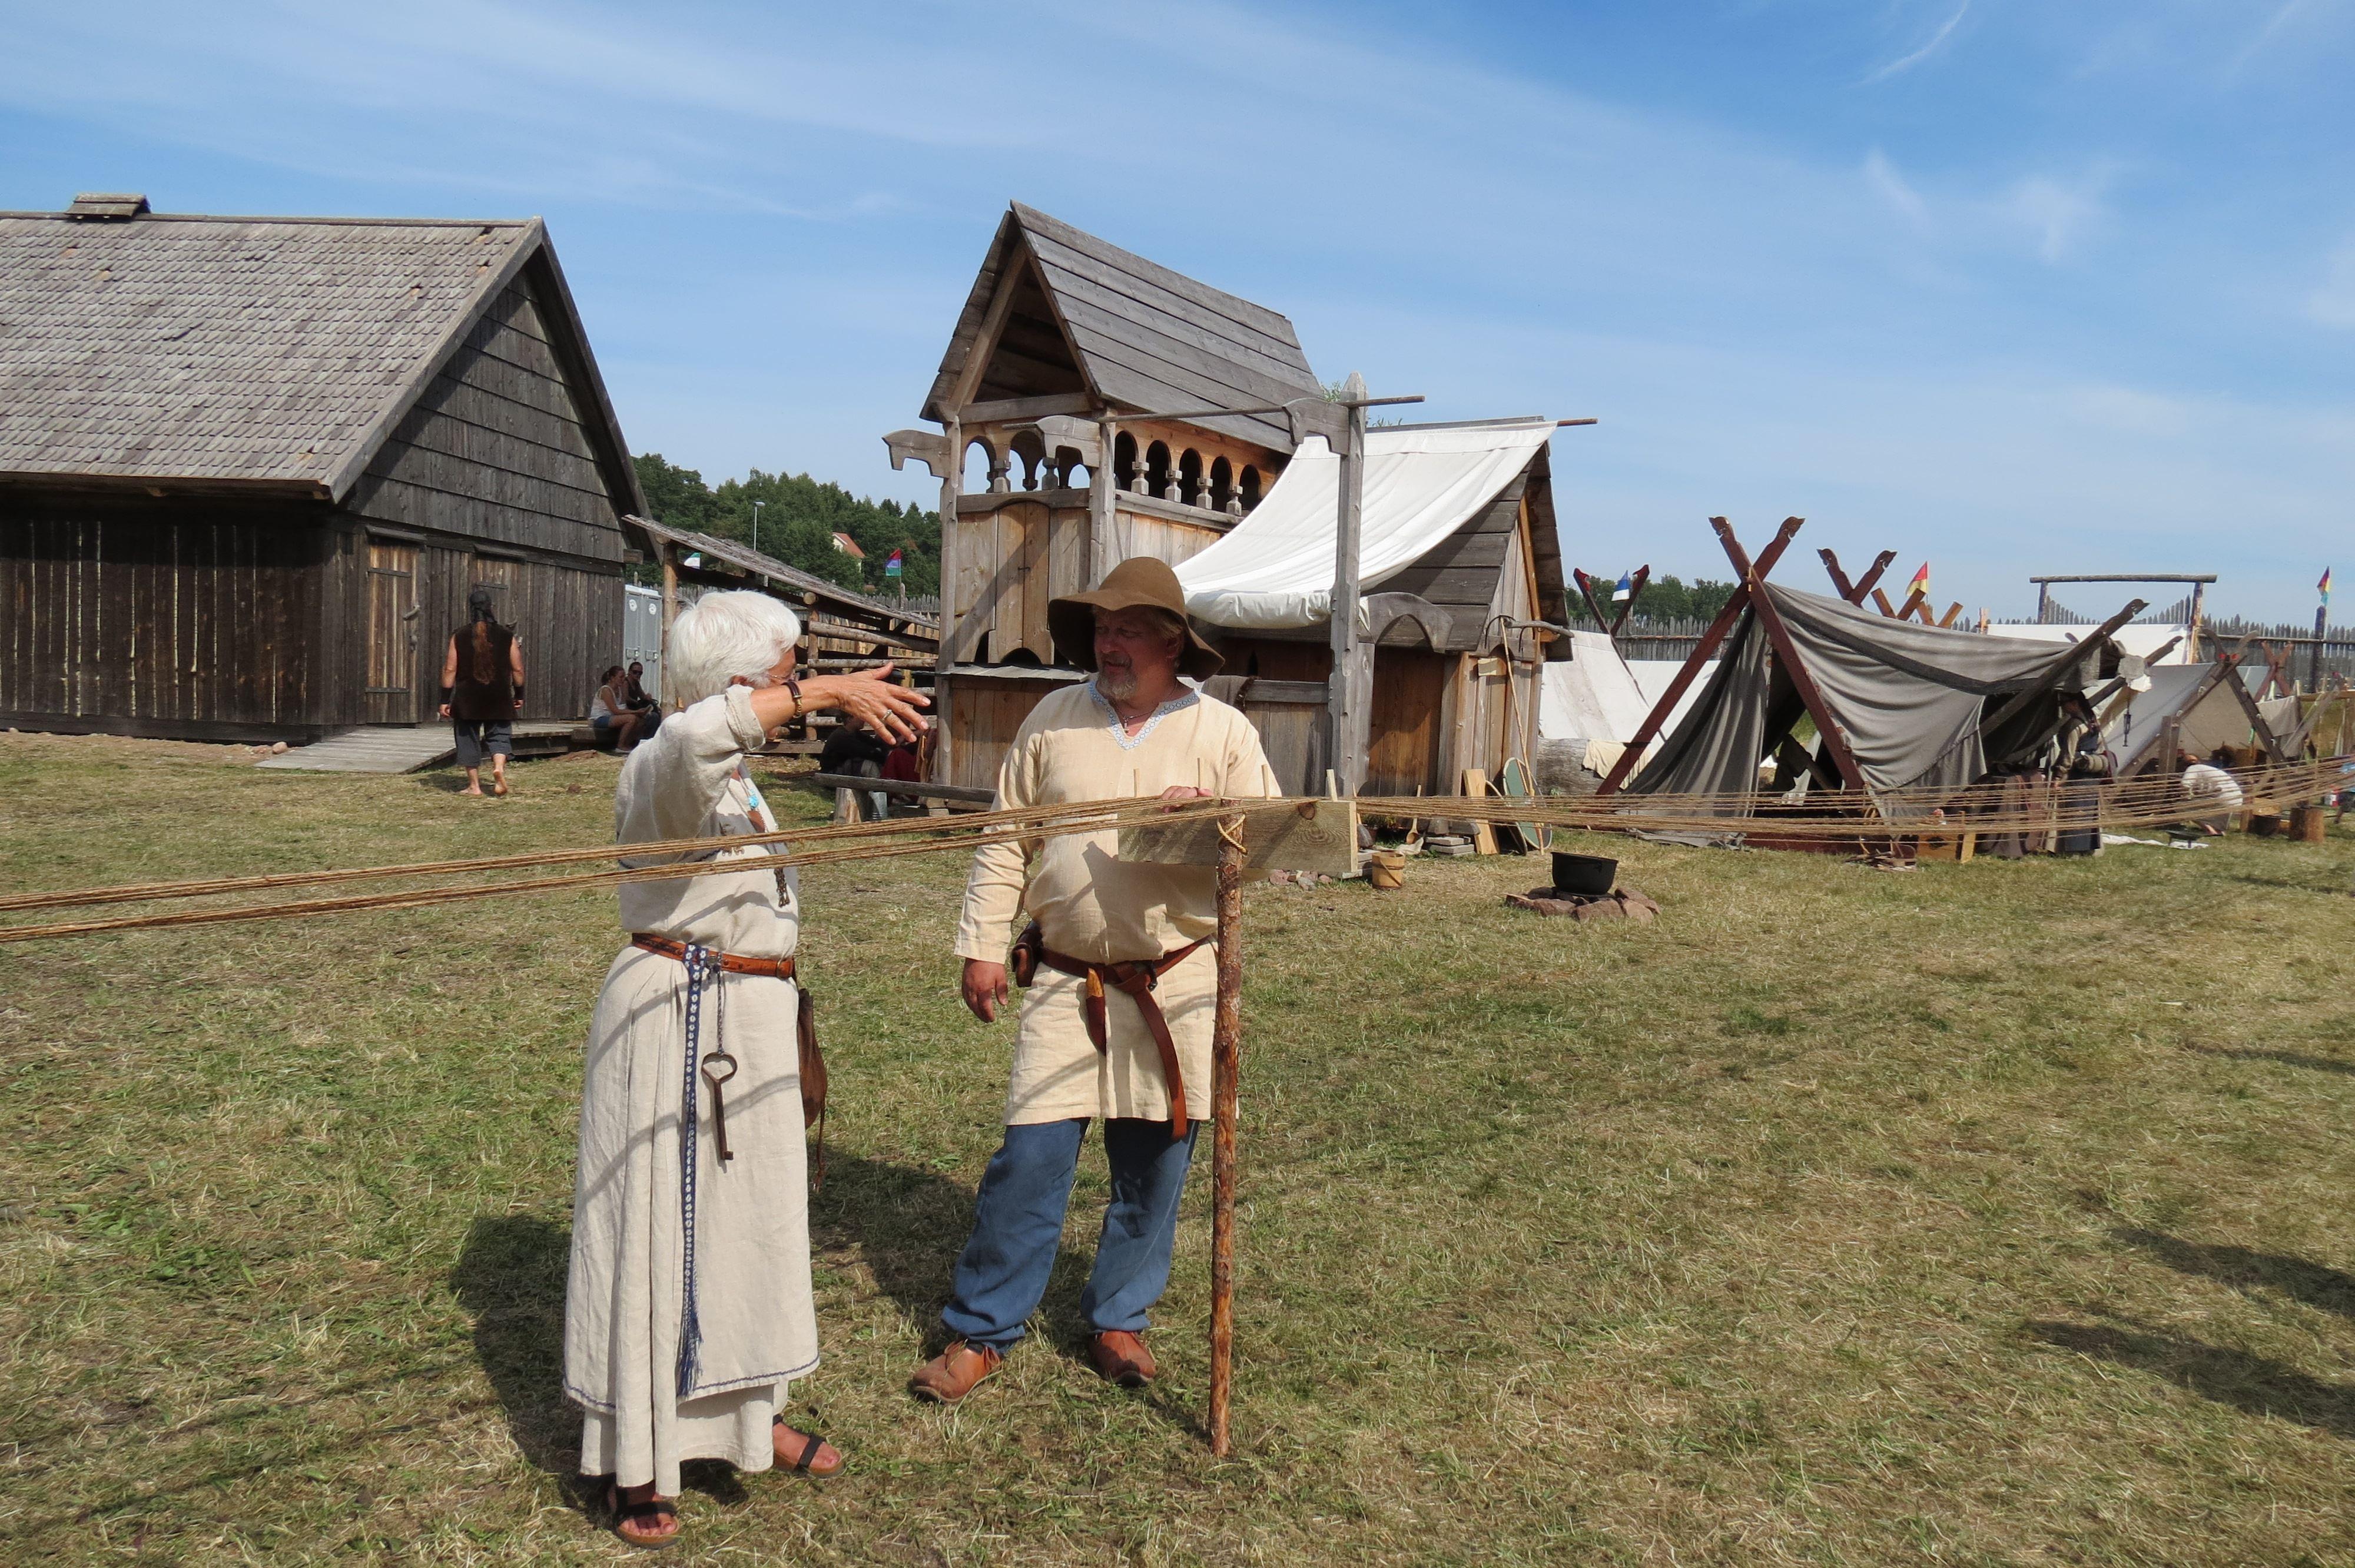 Viking Market 1-day ticket